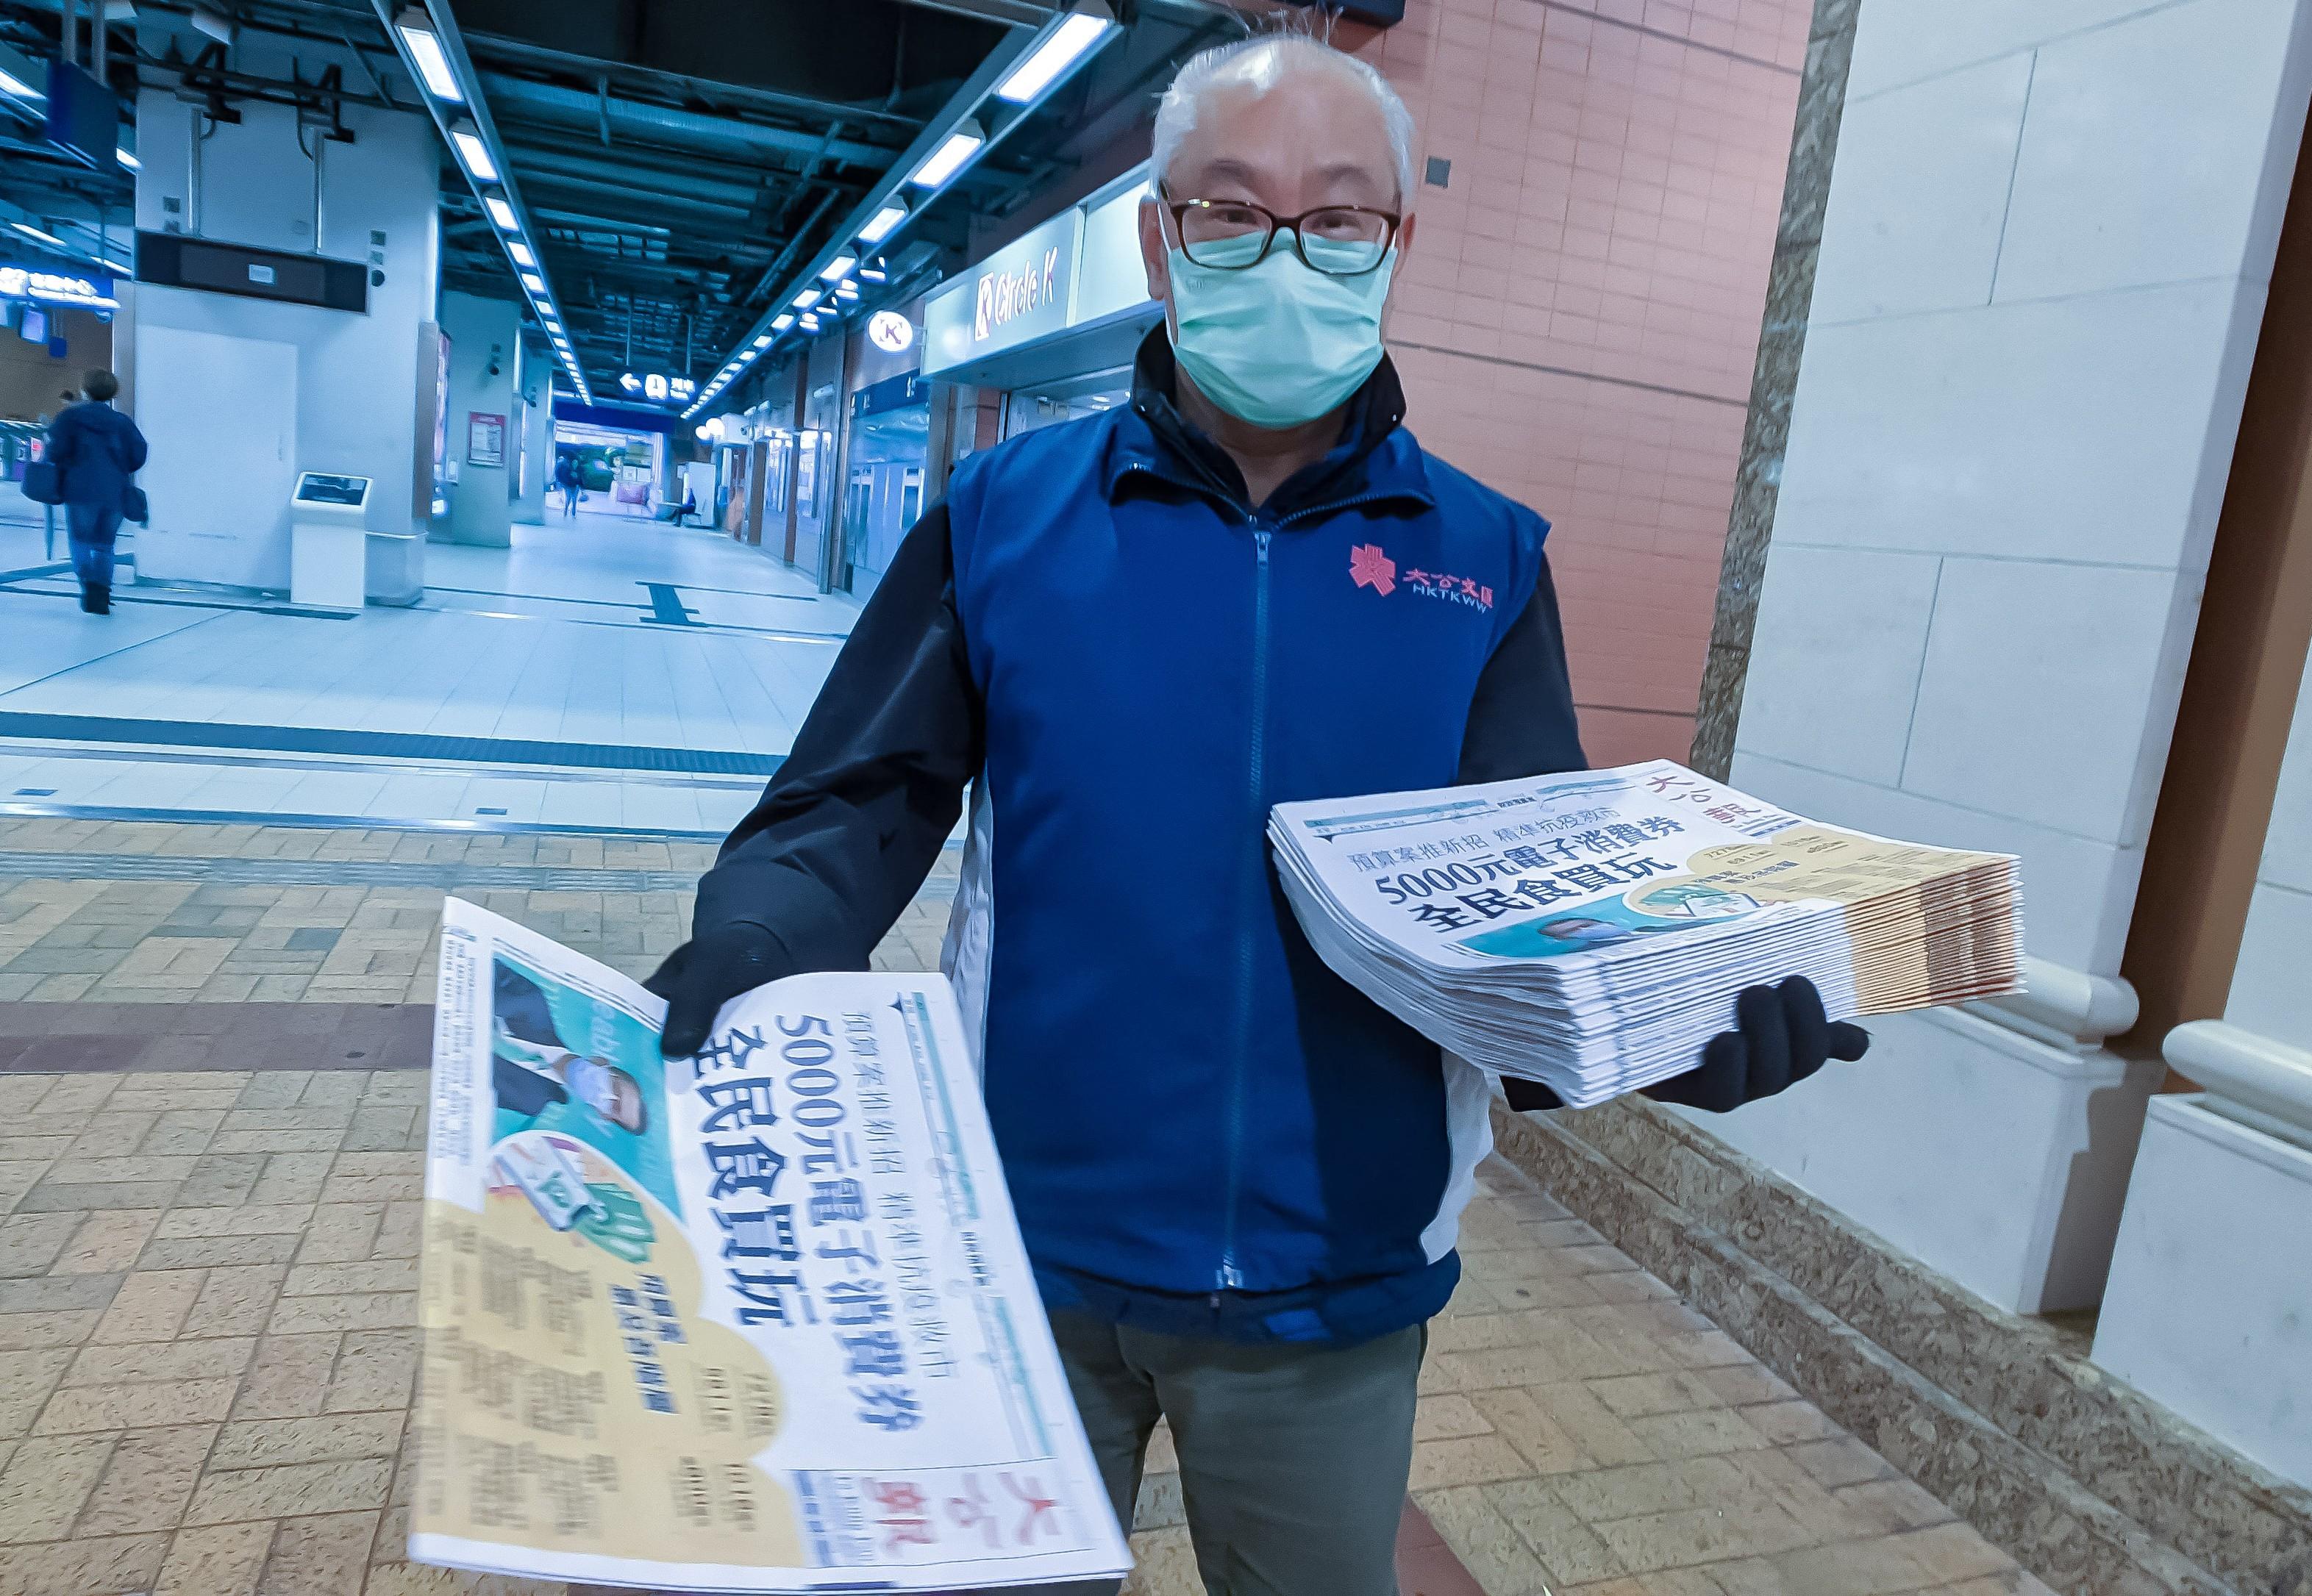 Kína hongkongi bunkósbotja